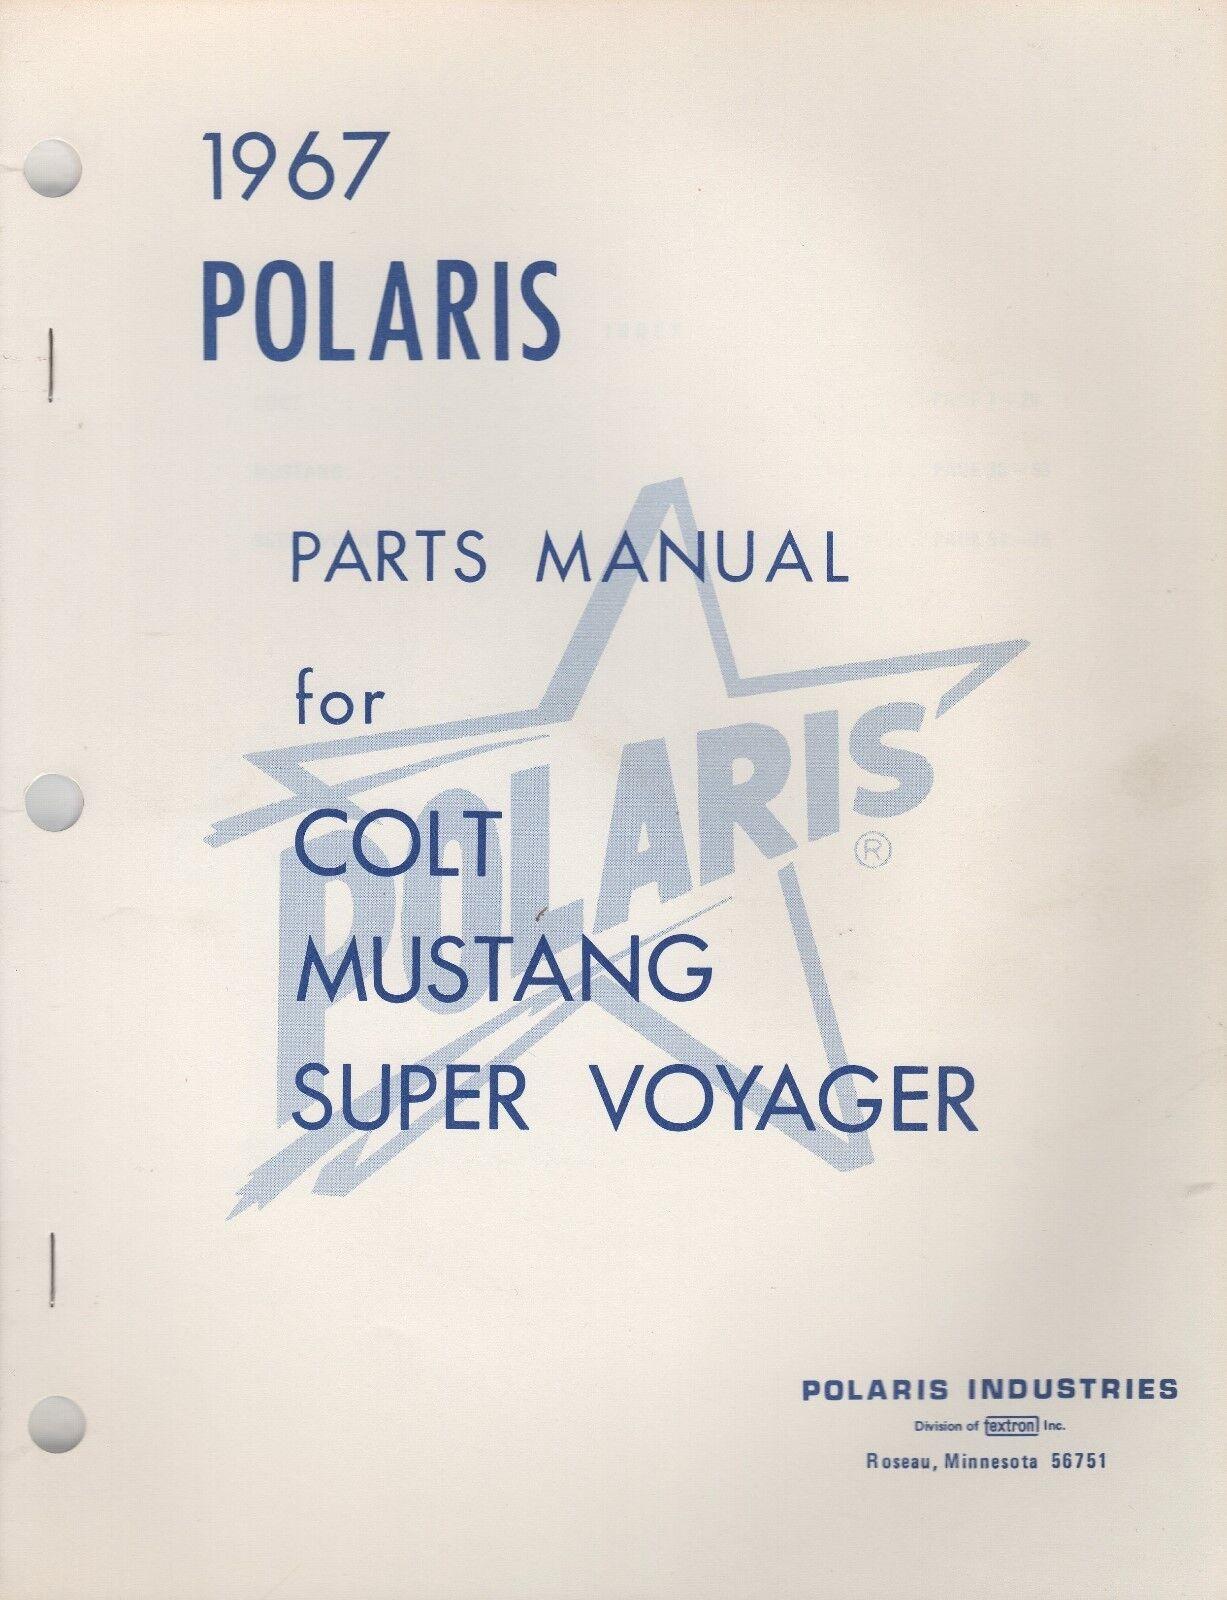 1967 POLARIS COLT, MUSTANG, SUPER VOYAGER   PARTS MANUAL (627)  factory outlet online discount sale